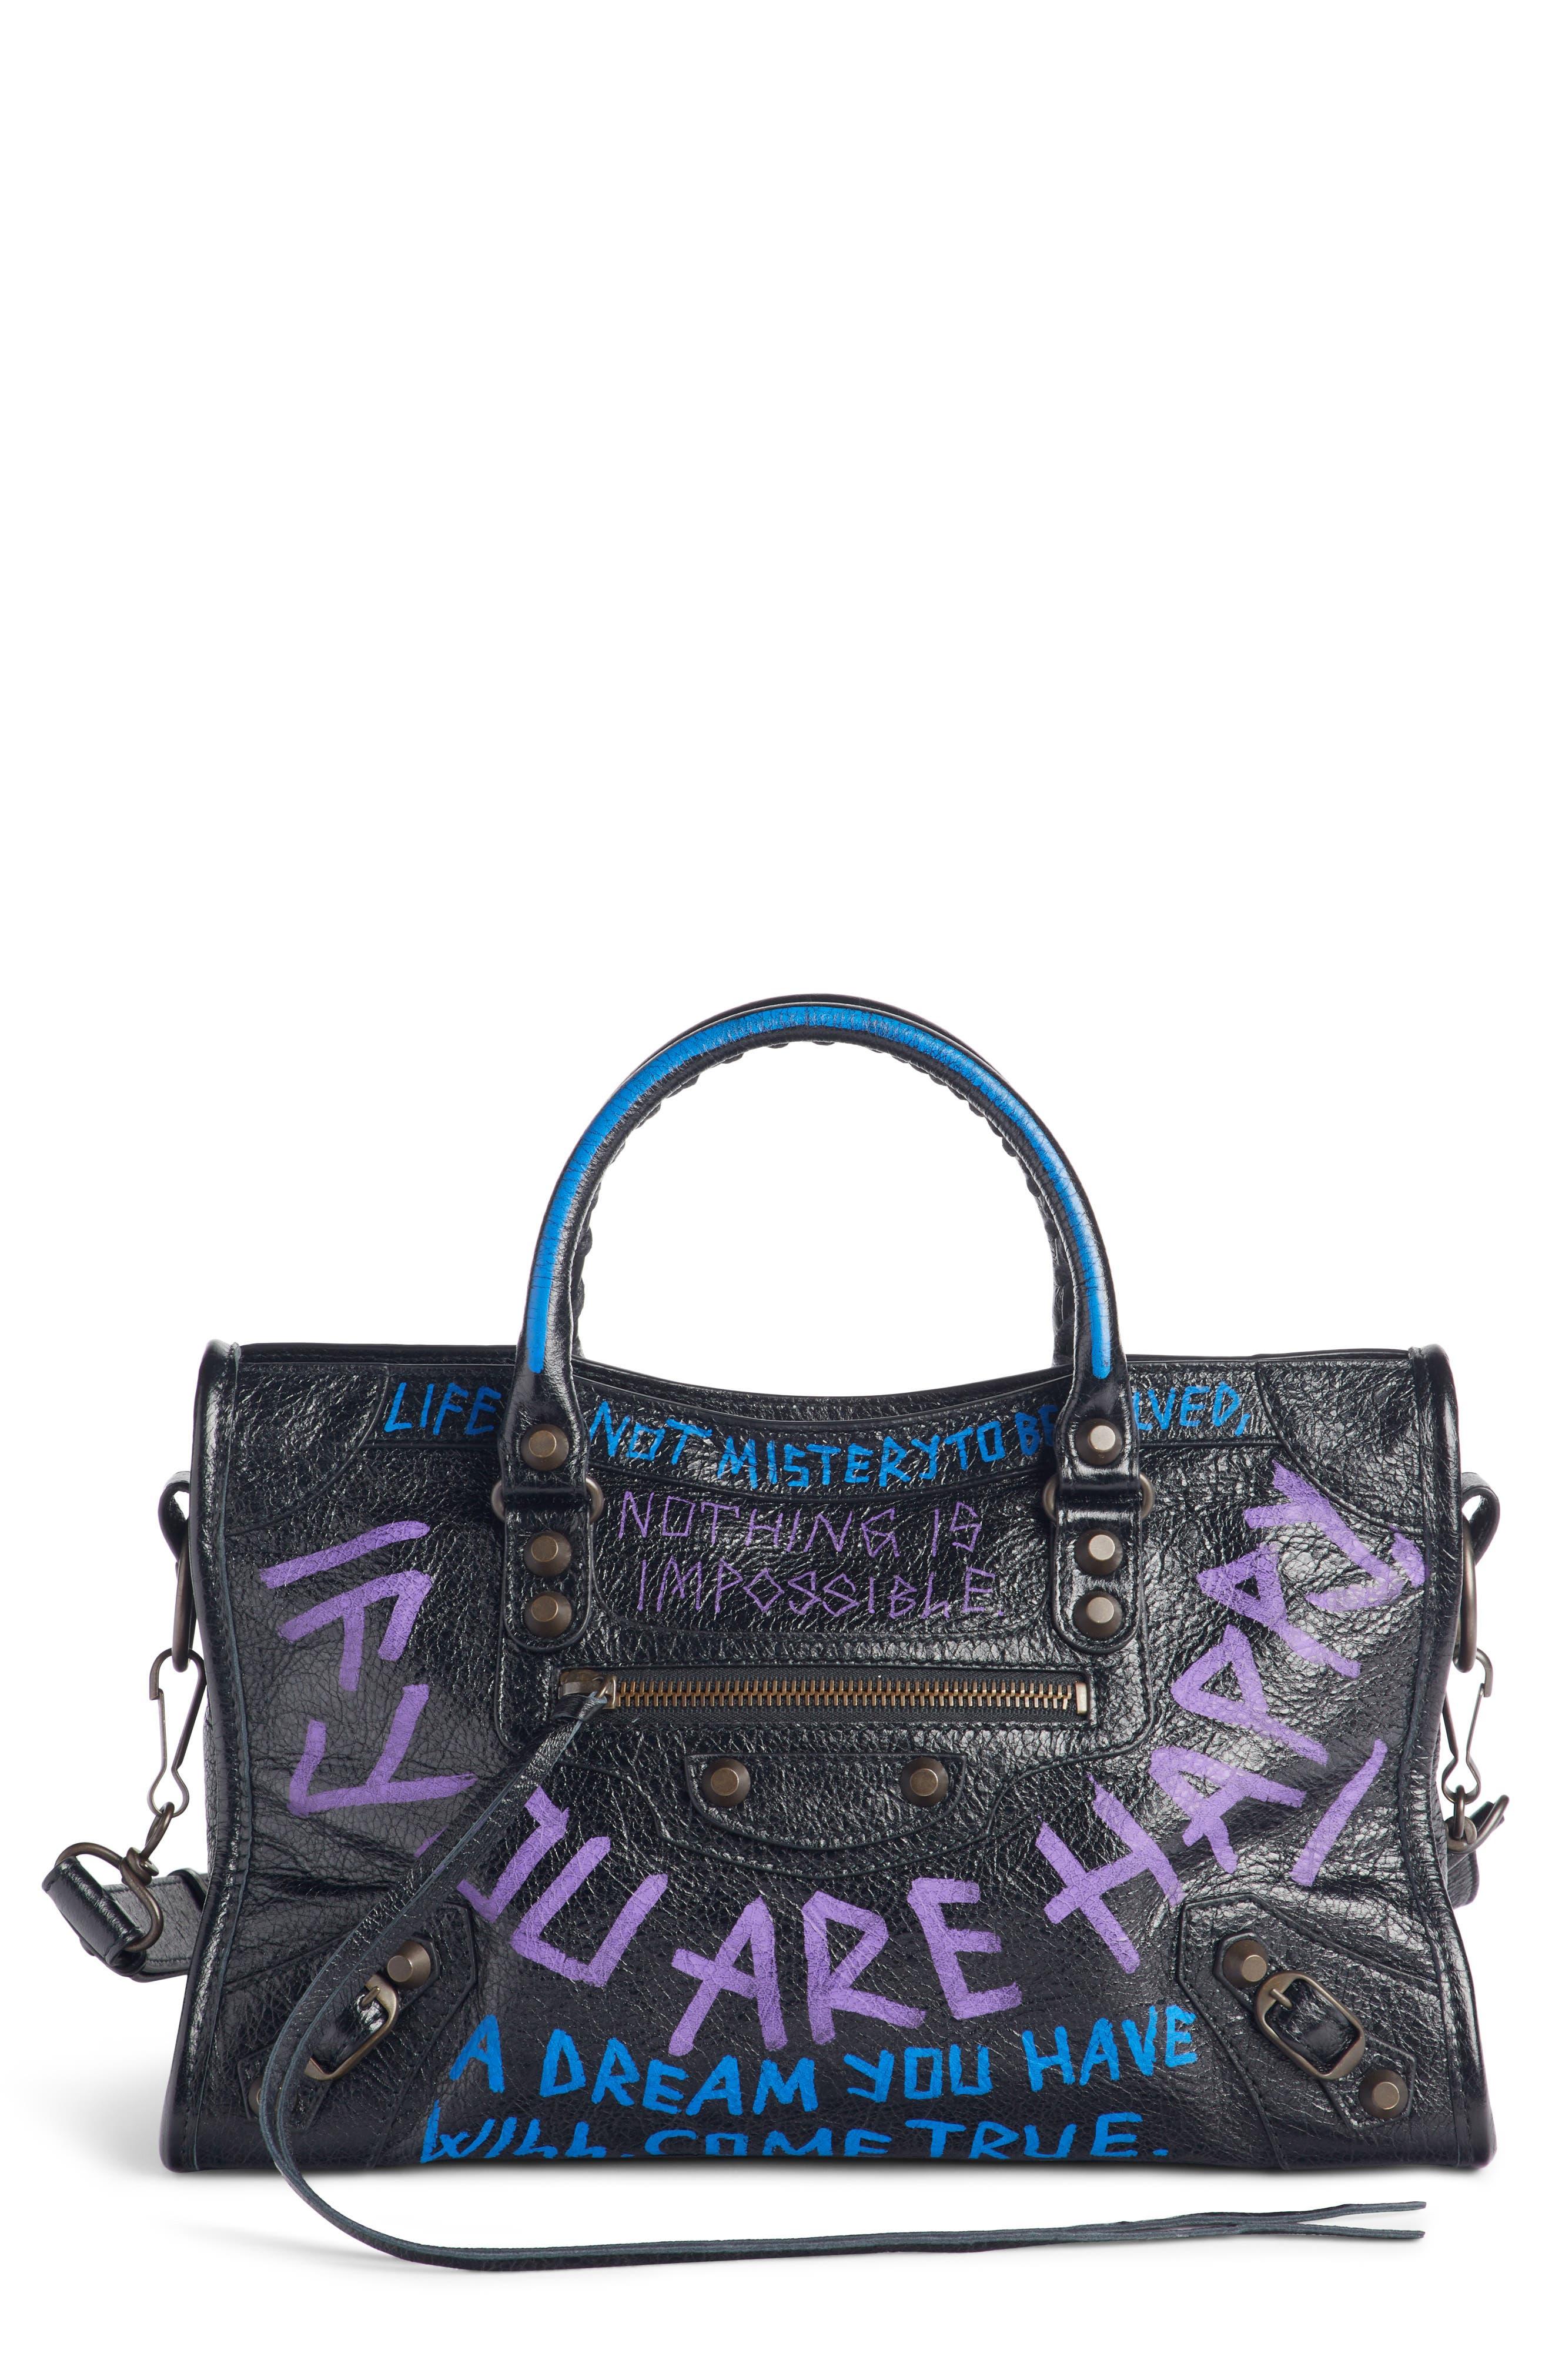 Small Classic City Graffiti Leather Tote,                         Main,                         color, NOIR/ BLEU/ VIOLET